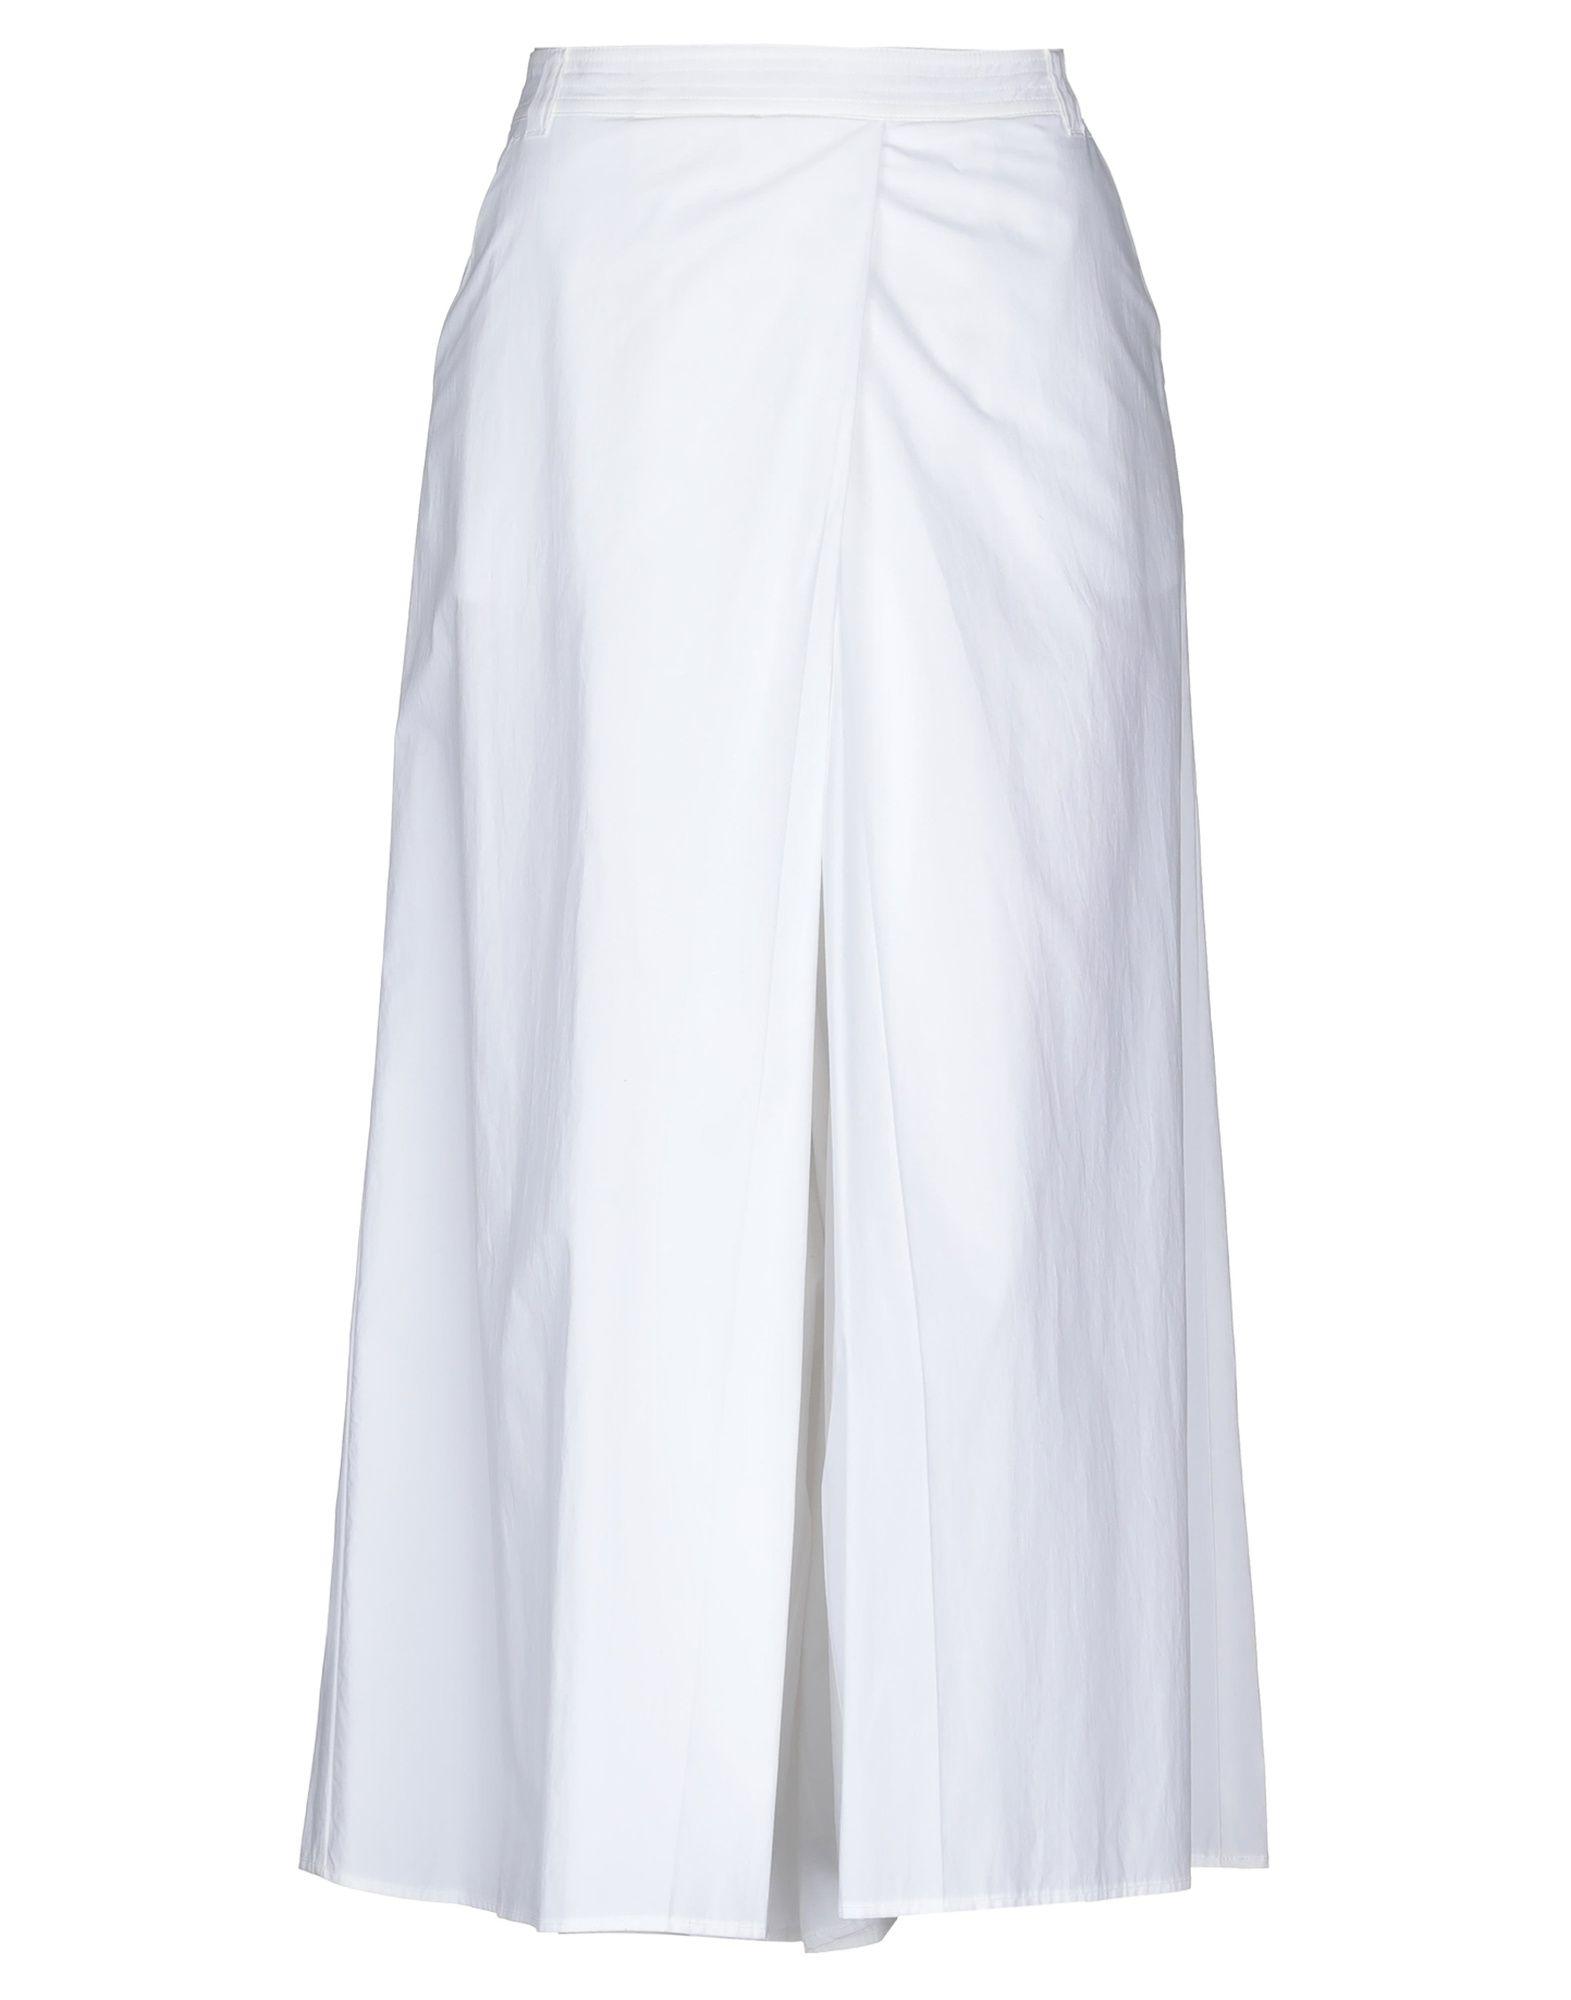 'S MAX MARA Юбка длиной 3/4 p a r o s h юбка длиной 3 4